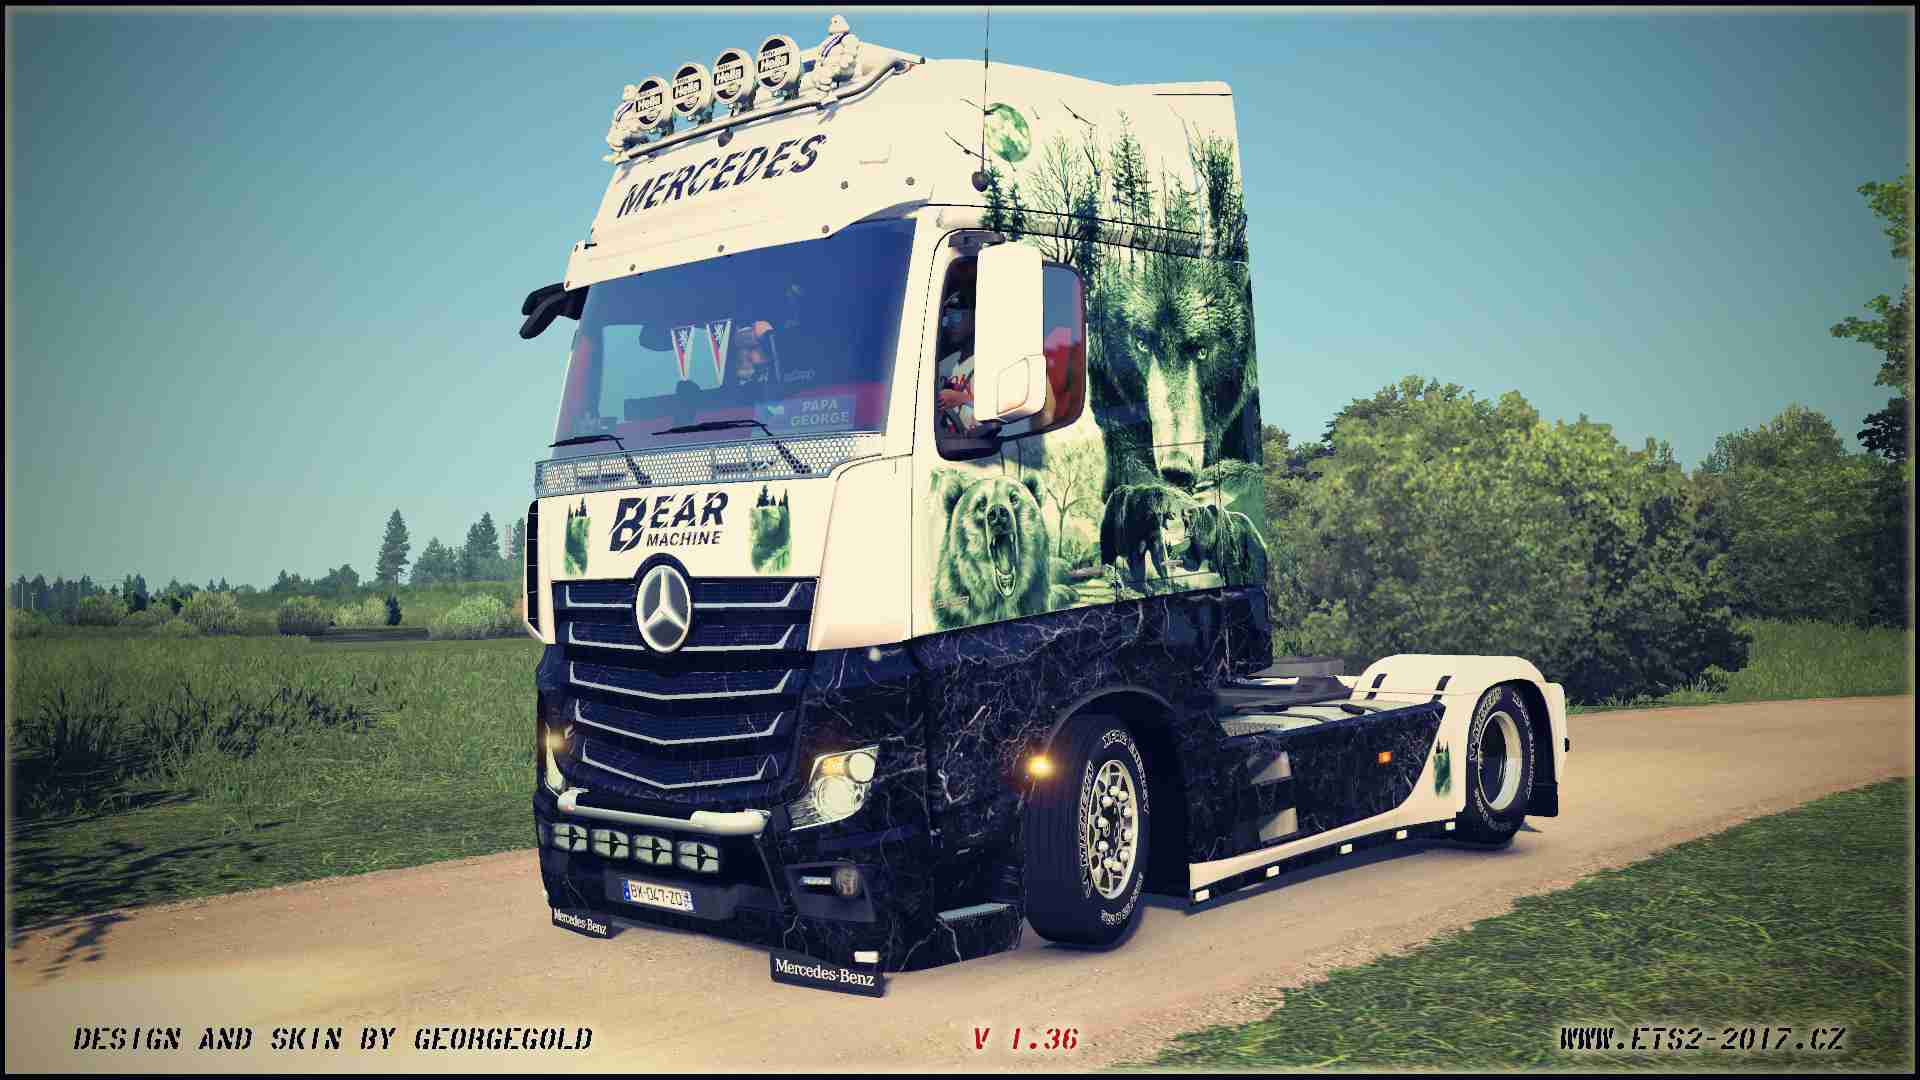 MP4 Bear Machine